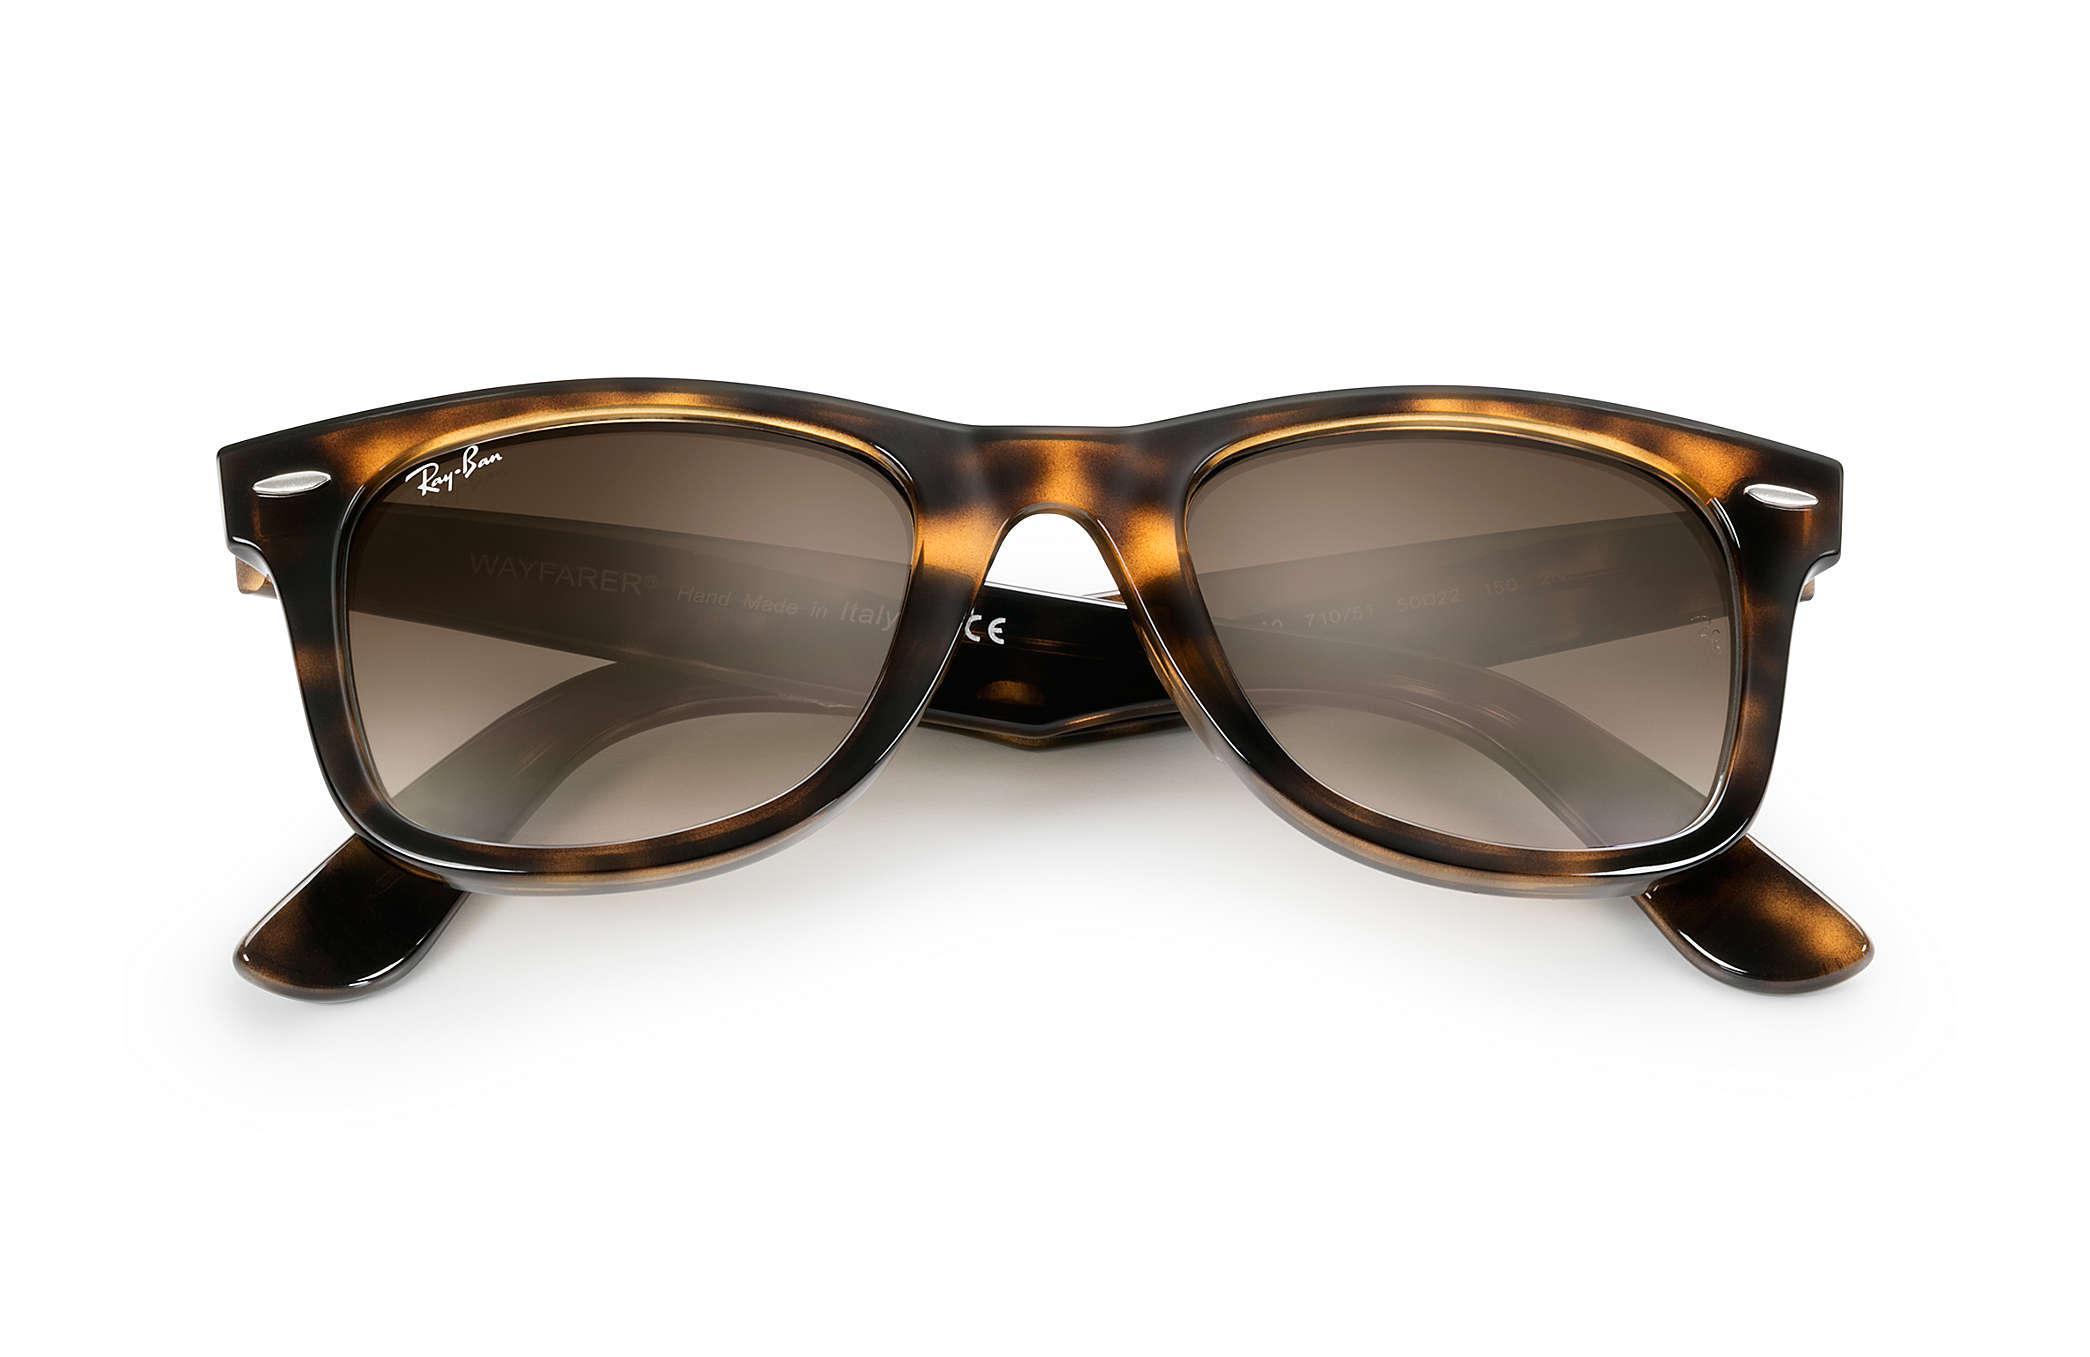 55610b881a Ray-Ban - Brown 50mm Wayfarer Ease Gradient Sunglasses - Lyst. View  fullscreen